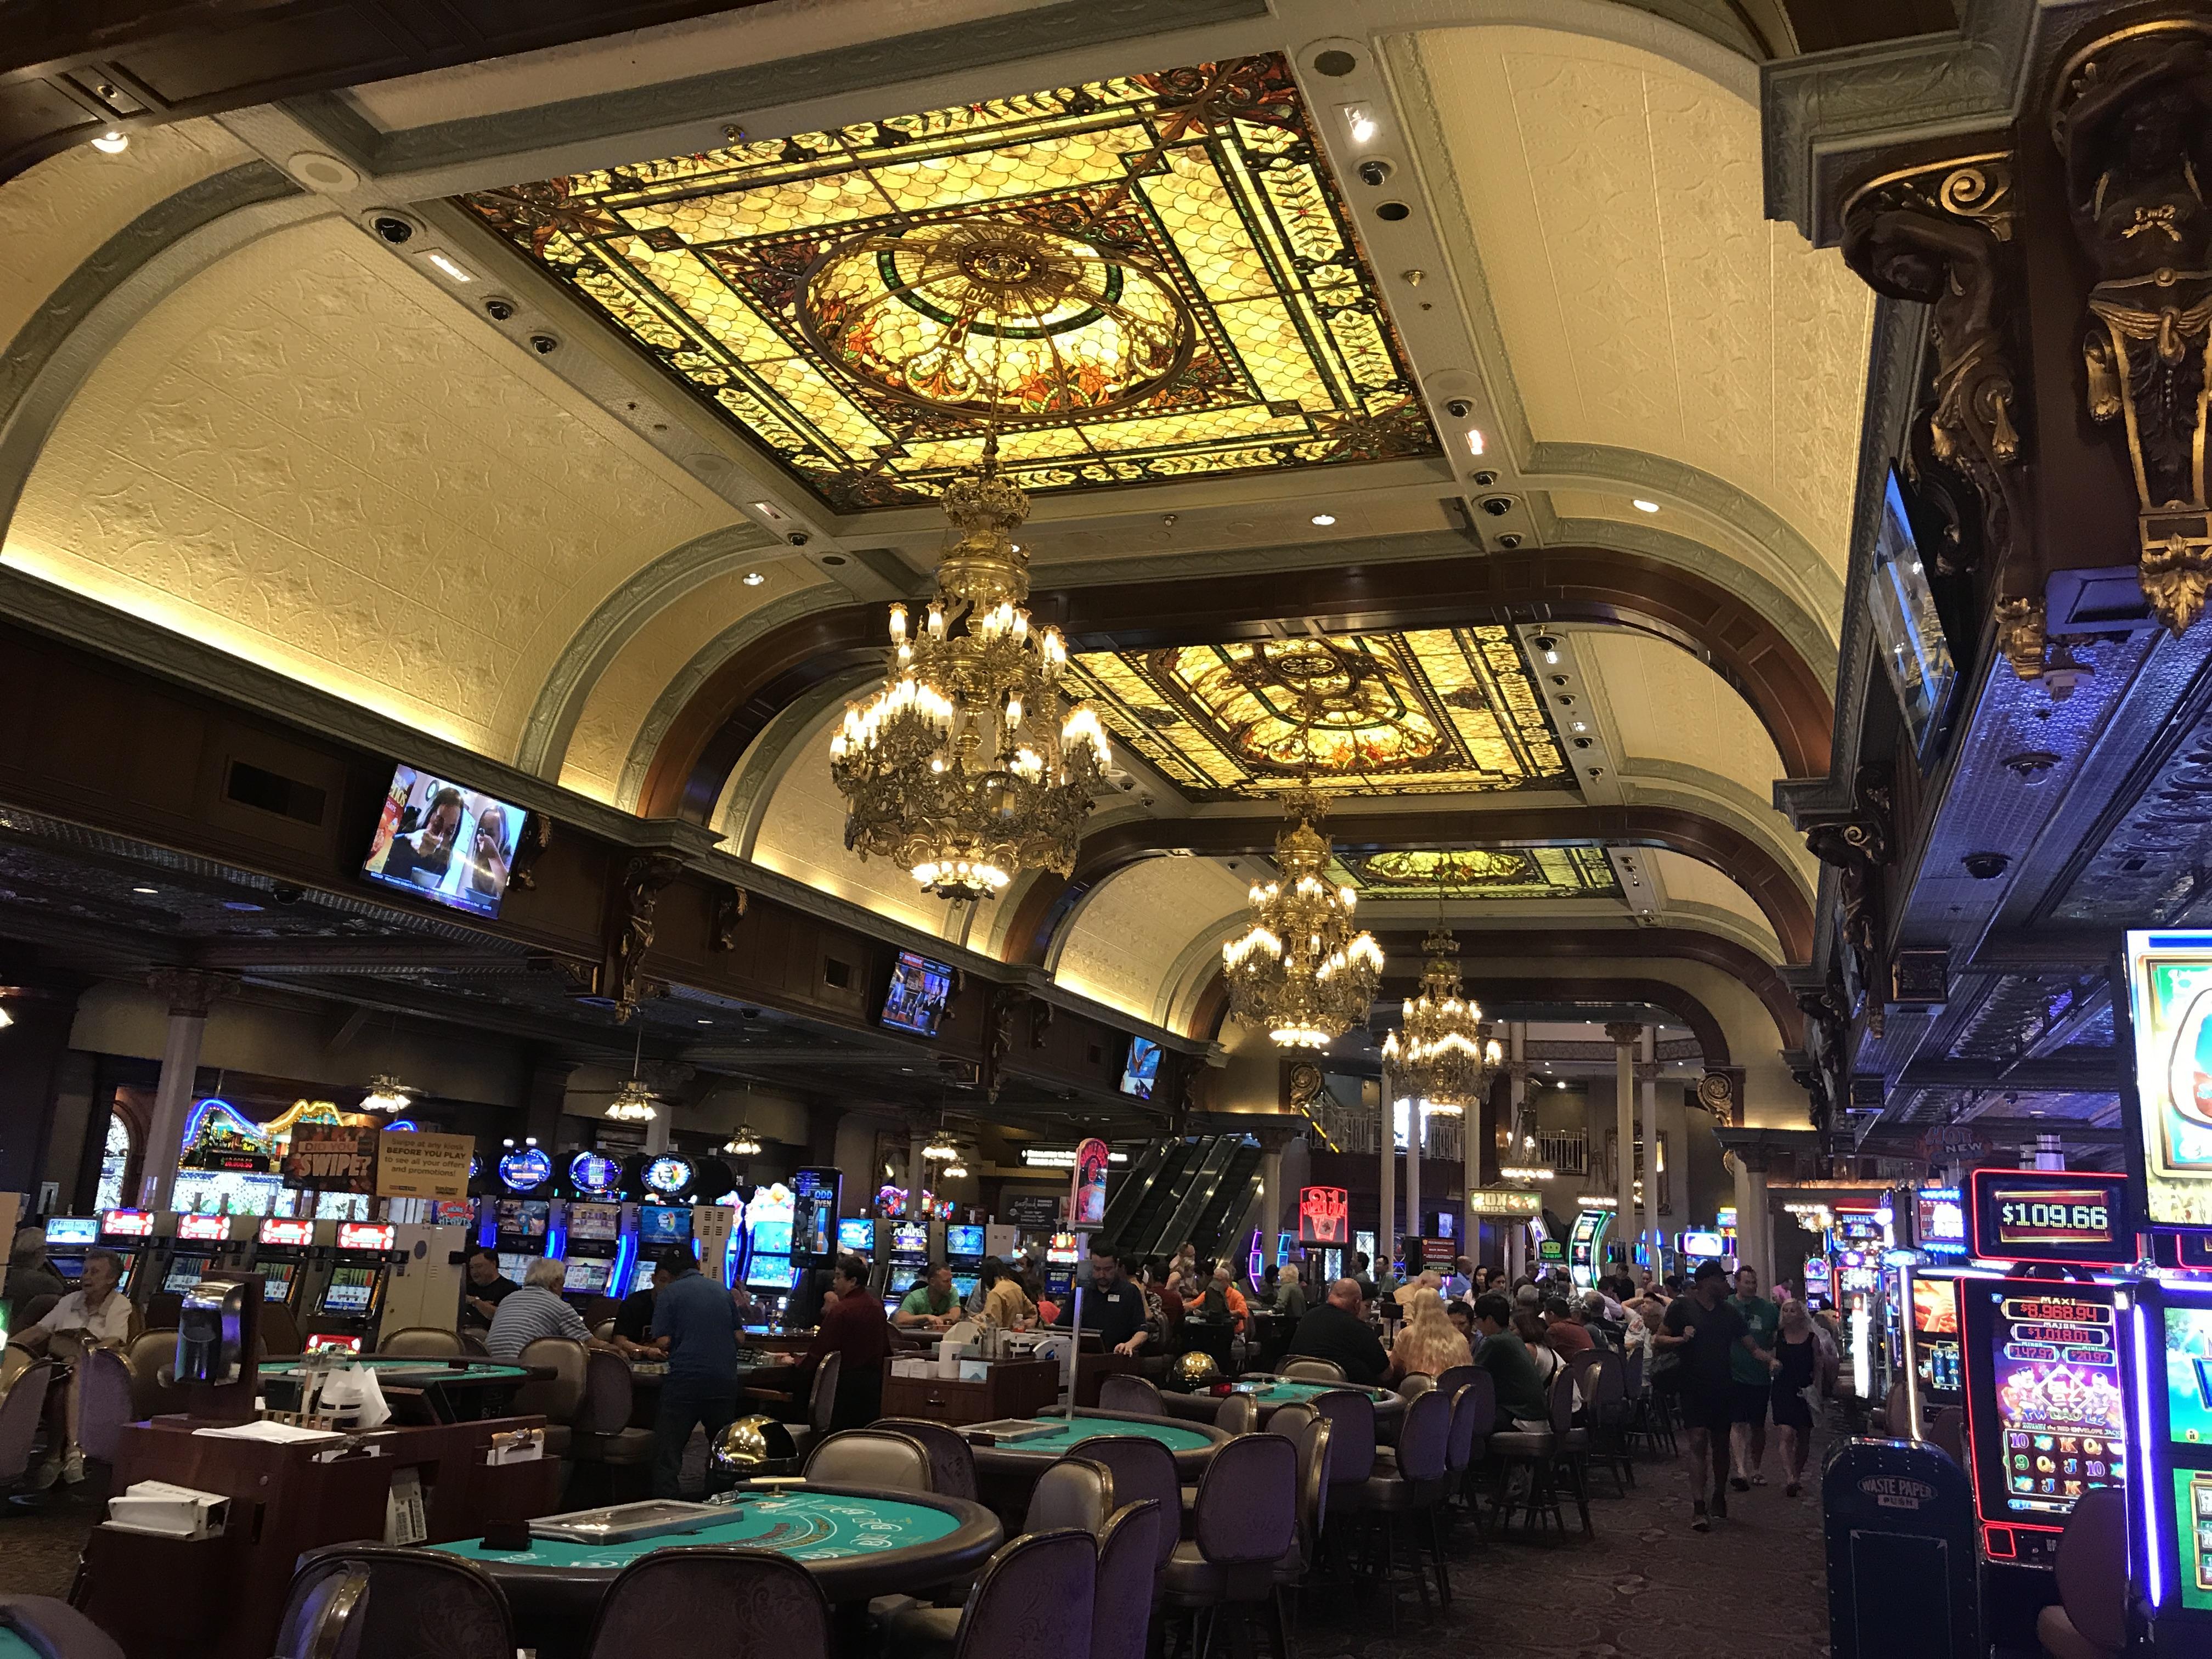 Phenomenal Reviewing Garden Court Buffet At Main Street Station Vegas Interior Design Ideas Gentotthenellocom